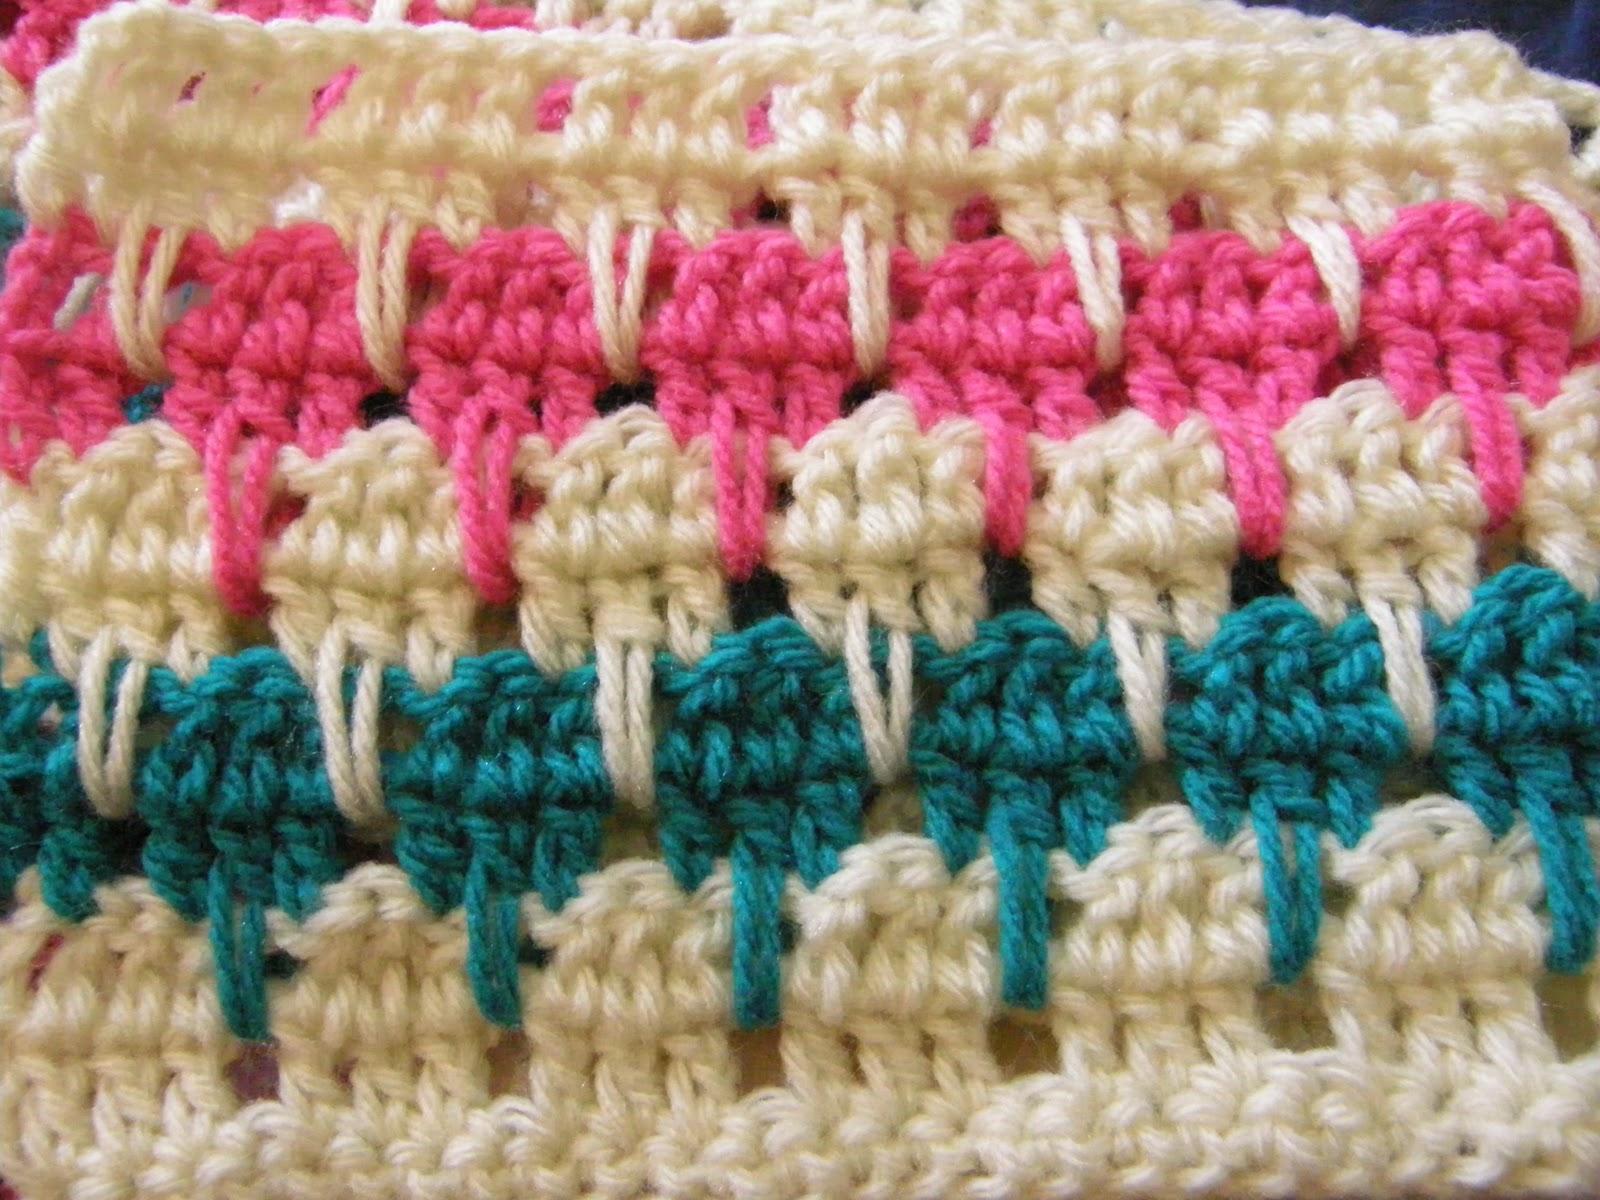 Larksfoot Crochet Afghan Pattern : :: How To Crochet A Larksfoot Blanket or An Arcade Blanket ...